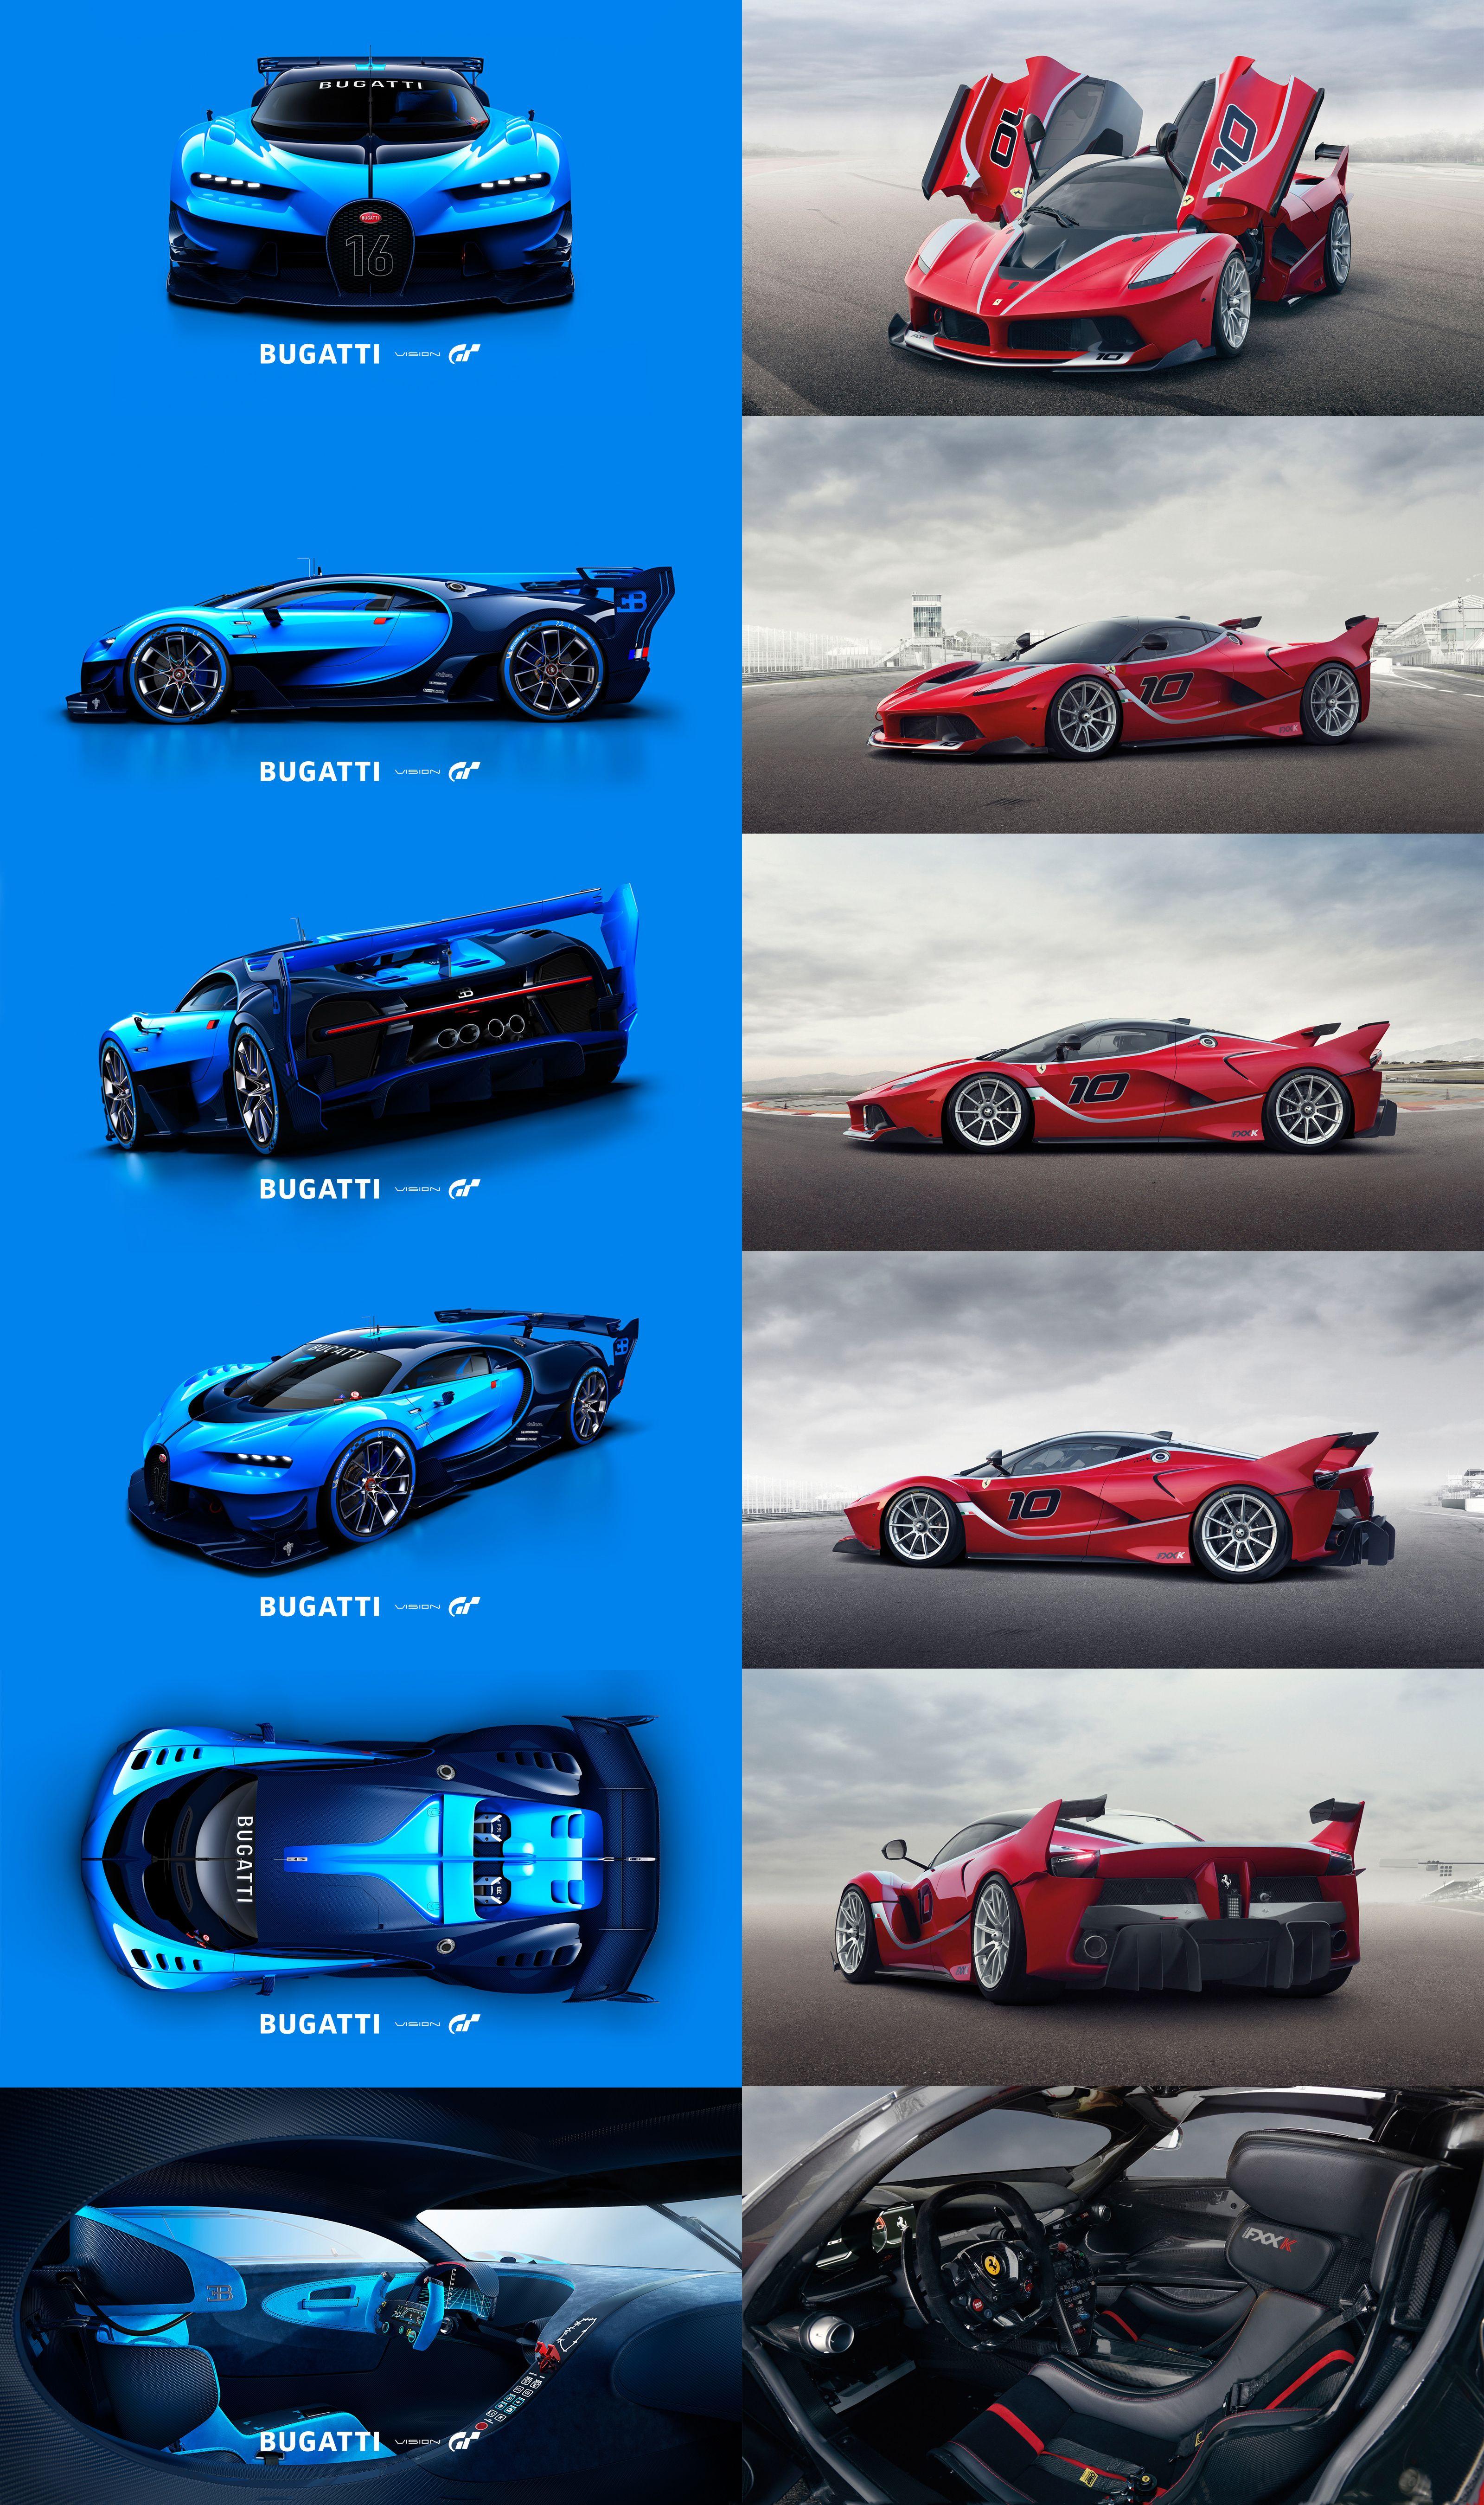 Bugatti Vision Gran Turismo Vs Ferrari Fxx K Bugatti Ferrari